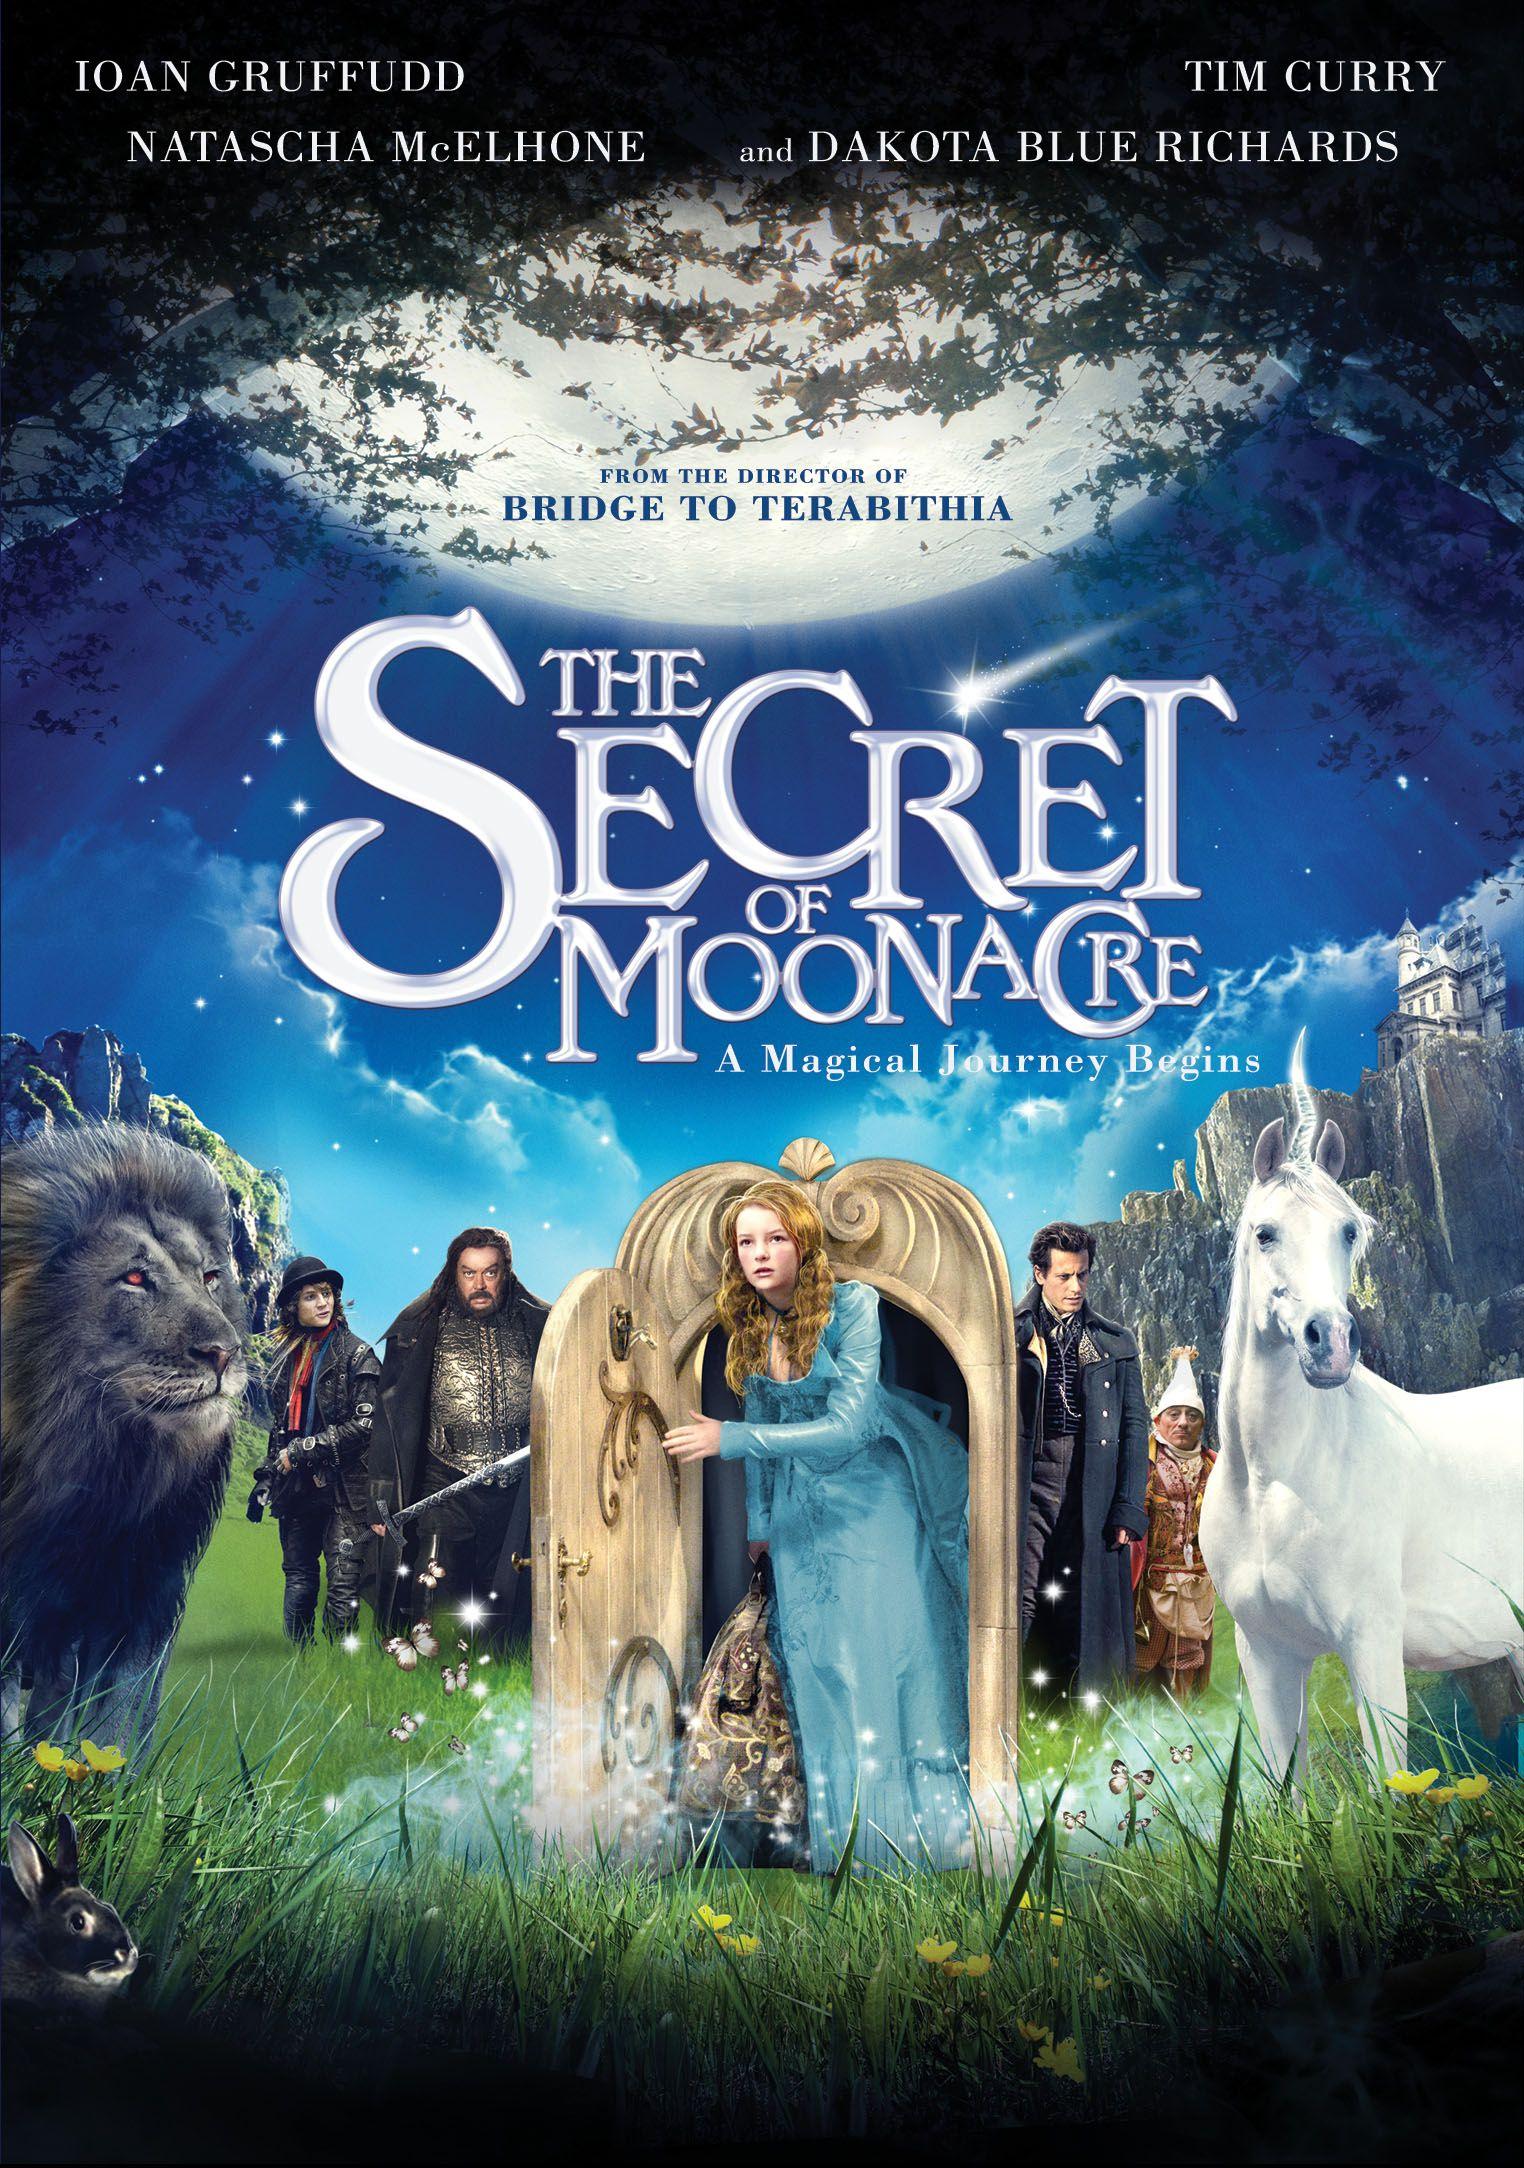 Suburban Turmoil Netflix Movies Funny Films The Secret Of Moonacre